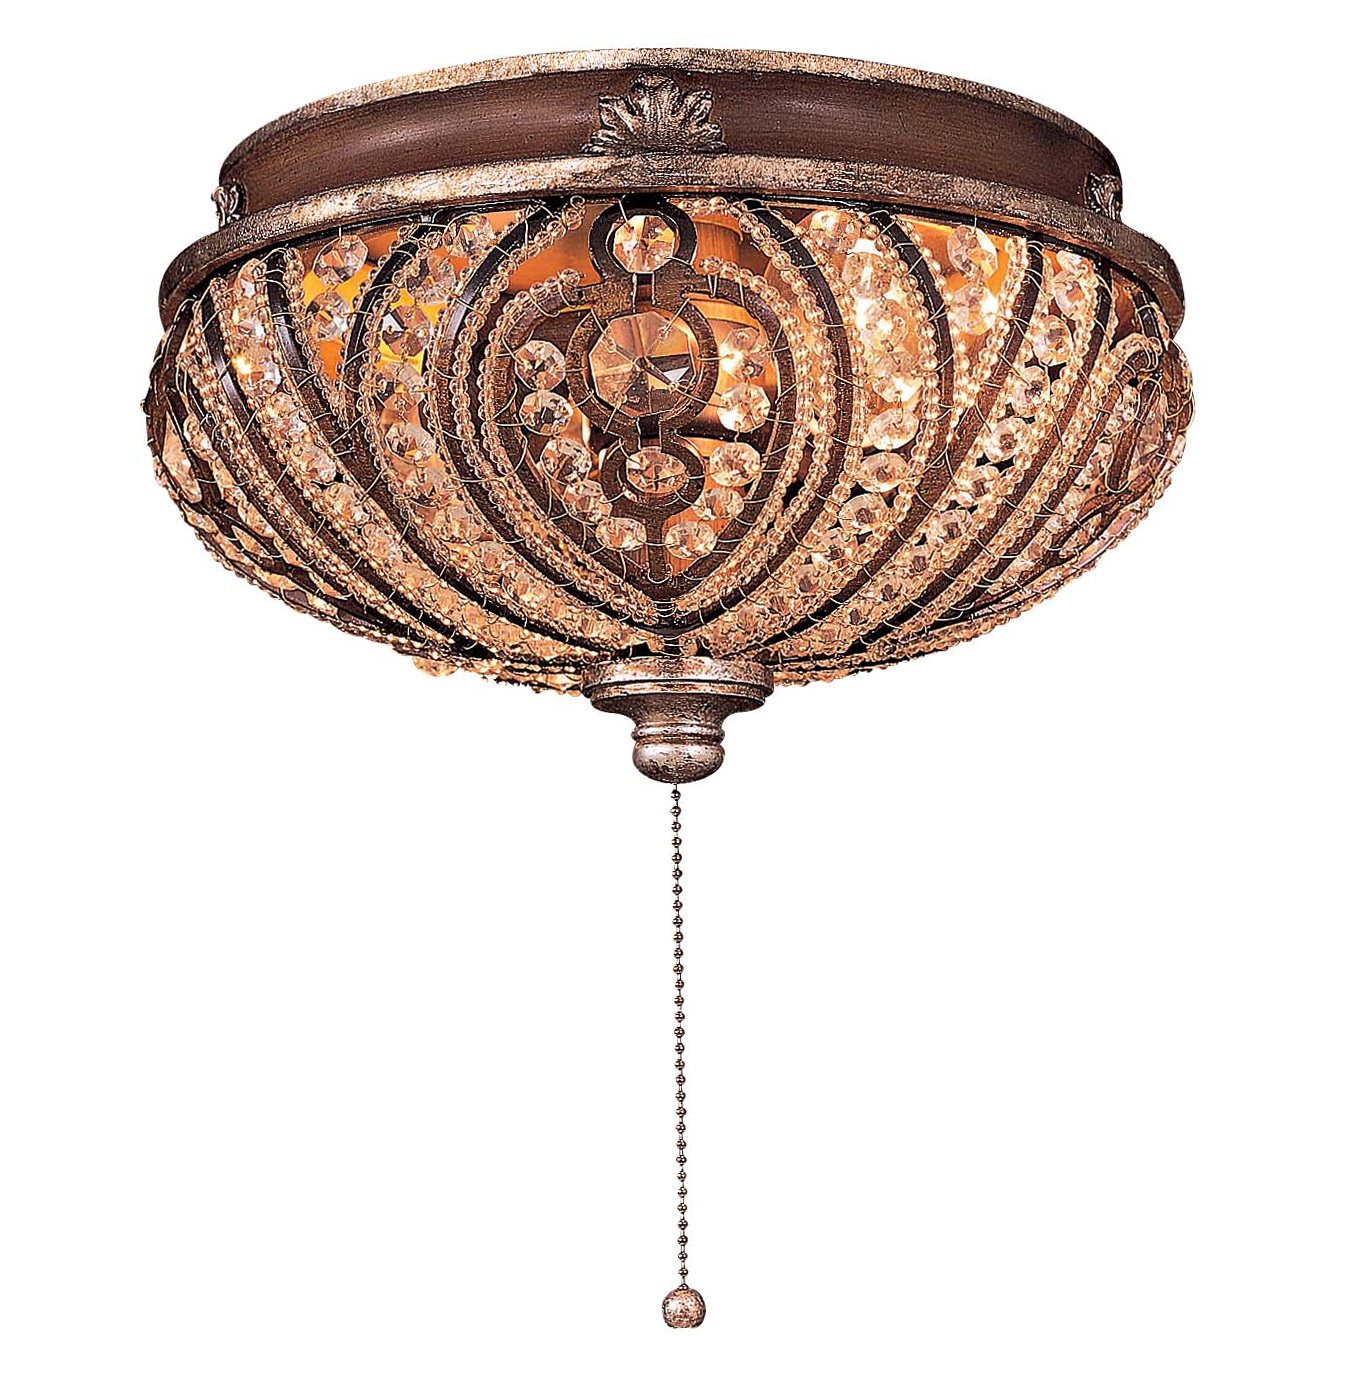 Crystal Chandelier Light Kit For Ceiling Fan